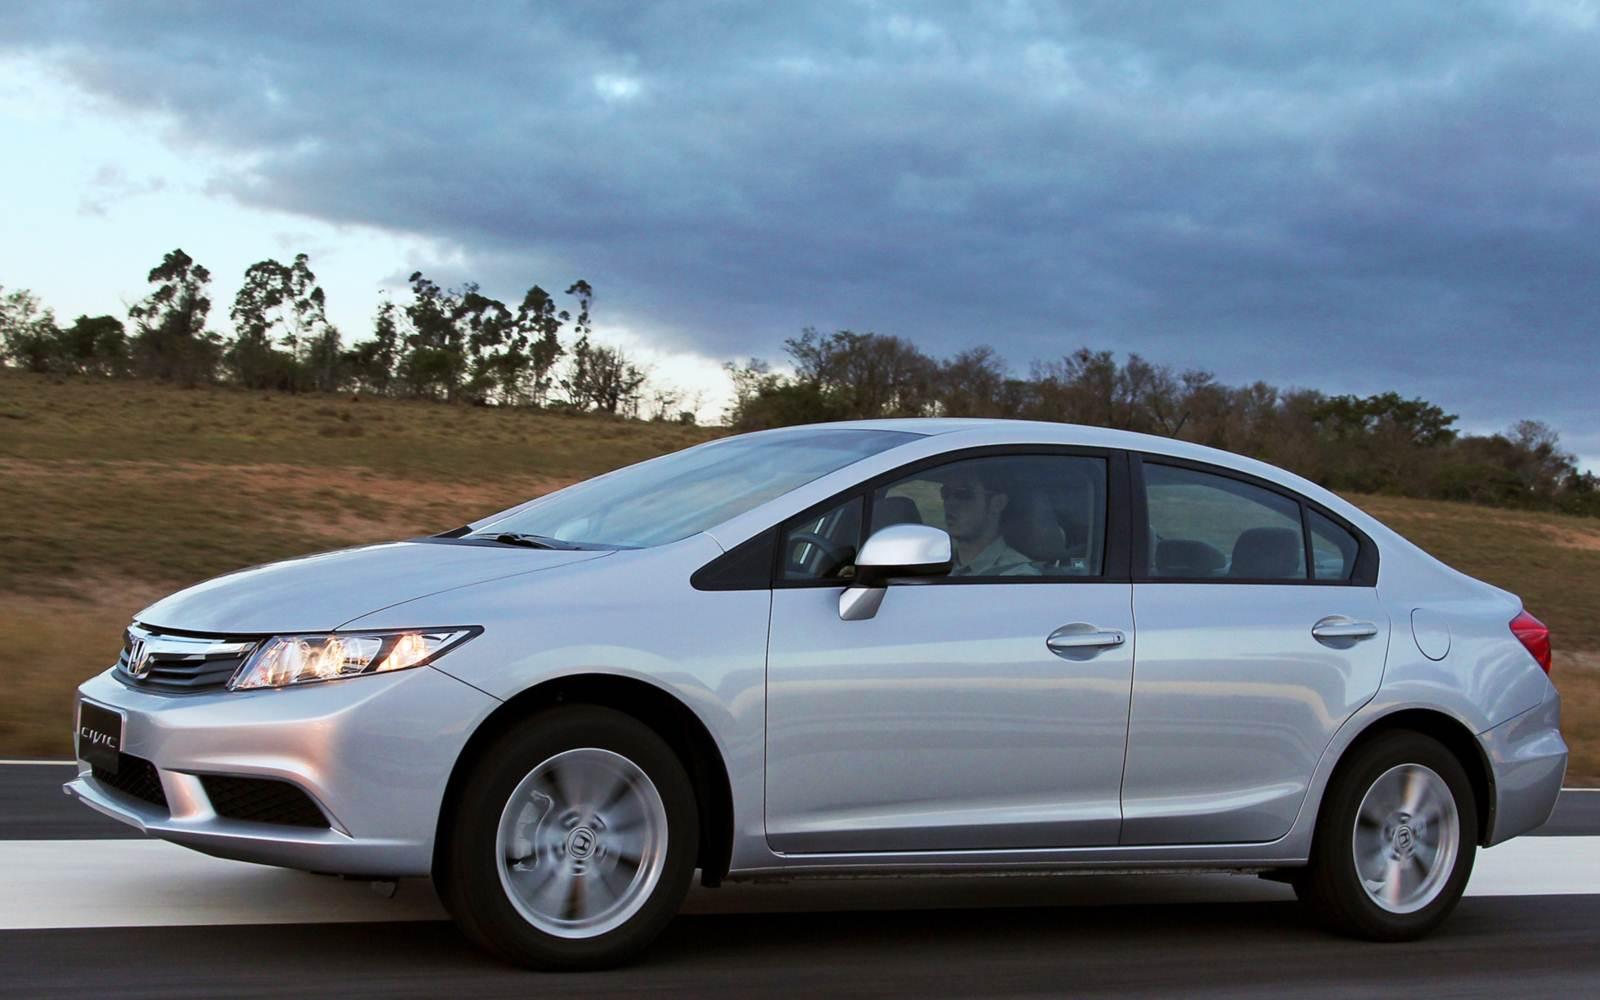 Honda civic lxs 1 8 2014